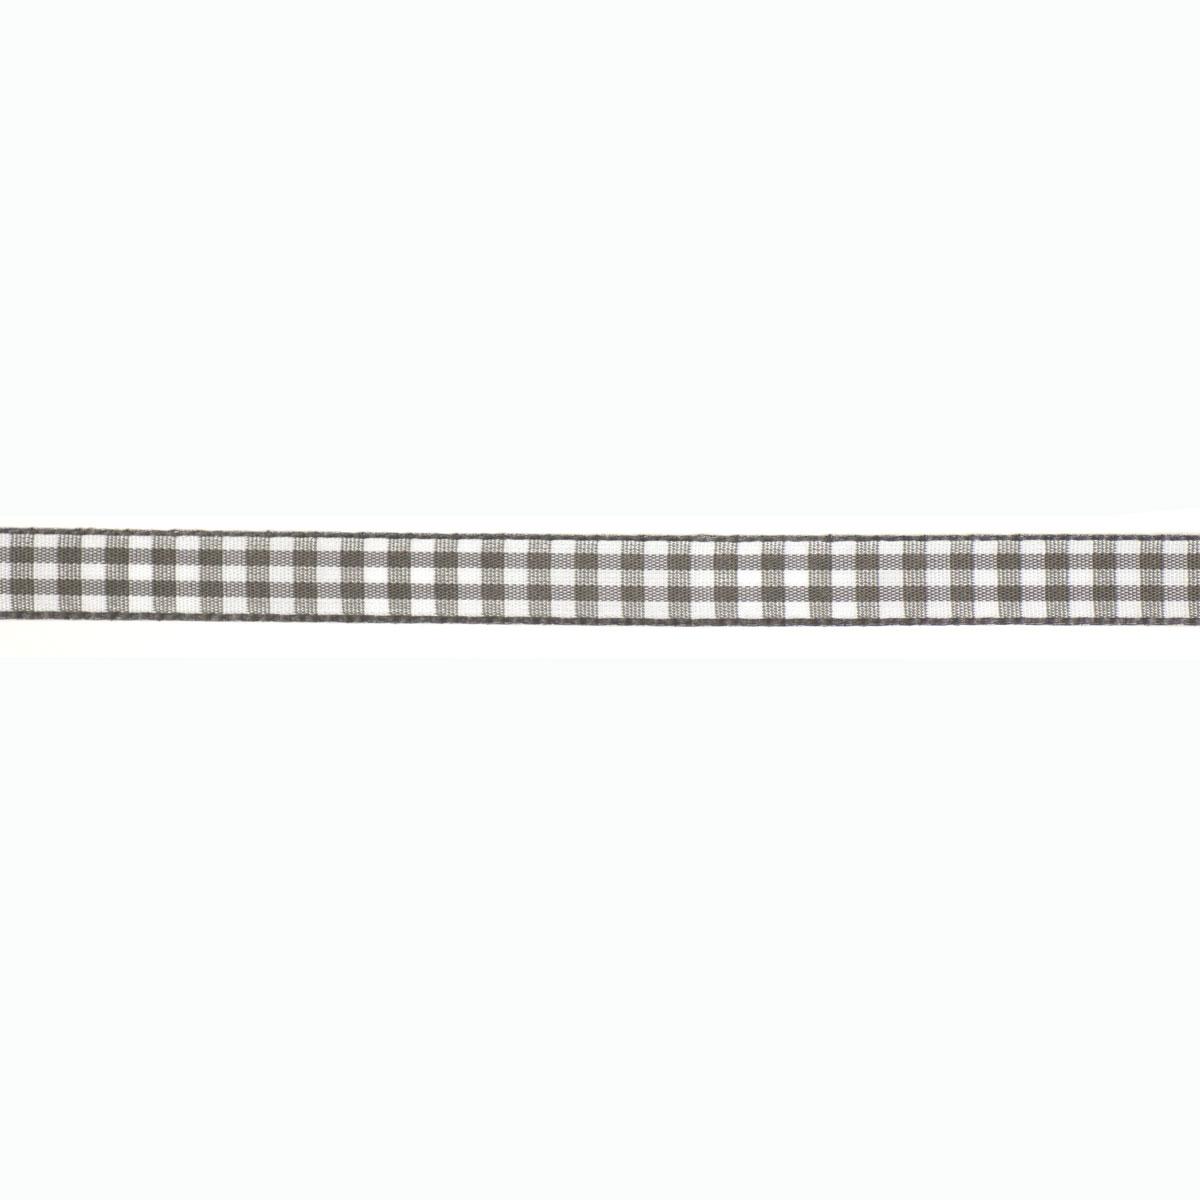 REStyle Ruitlint 15mm Donker Grijs-002